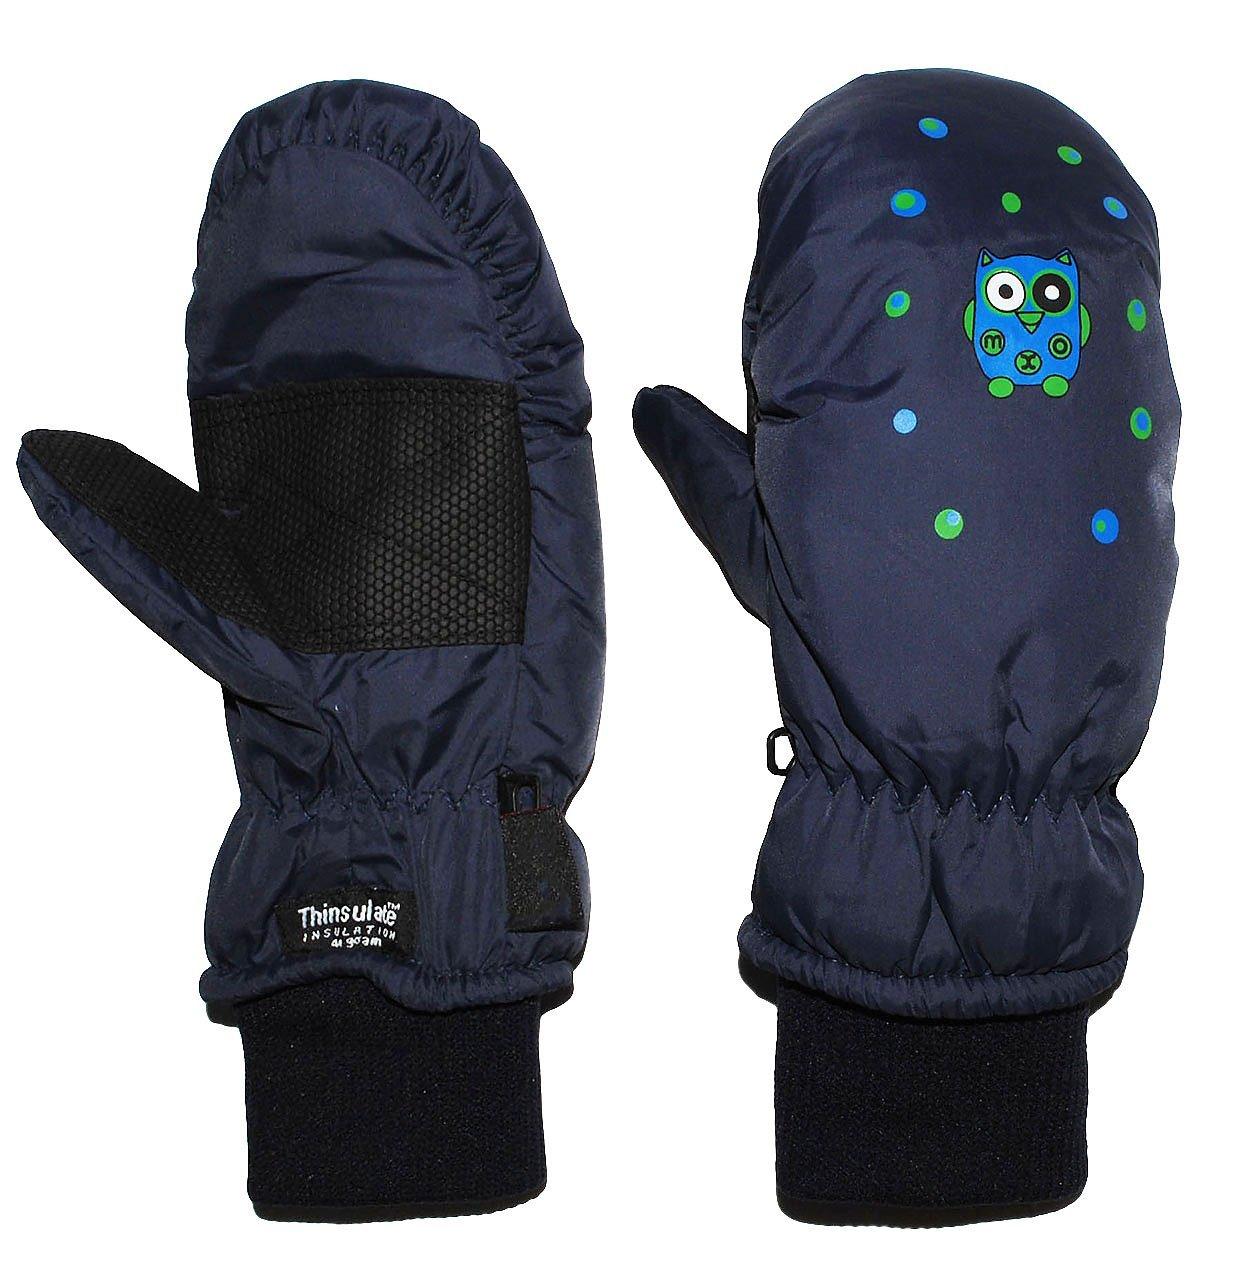 Handschuhe / Fausthandschuhe - mit langem Schaft / Bündchen - Eule - dunkelblau / blau Eulen - Gr. 3 - 4 Jahre - Thermo gefüttert Thermohandschuhe - wasserdicht + atmungsaktiv Thinsulate / Fausthandschuh Handschuh - Kinder Mädchen Jungen